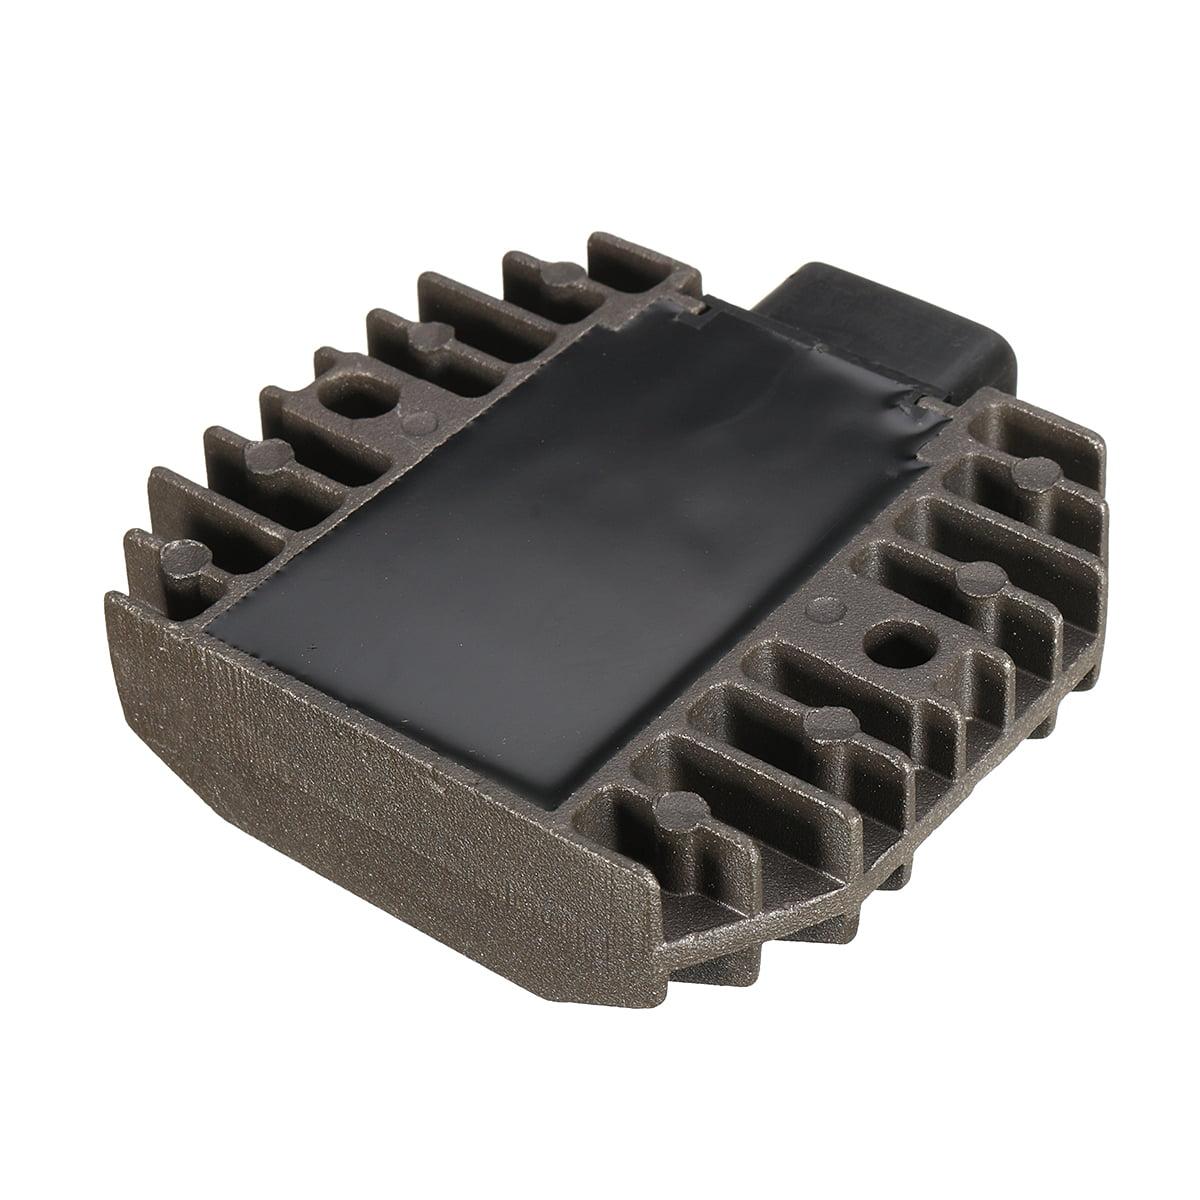 Voltage Regulator Rectifier Fits For Yamaha Grizzly 600 YFM600 Kodiak 450 YFM450 Rhino 450 YXR450 Rhino 660 YXR660 RAPTOR 700 YFM700 YZF R6 Repl.# 5BN-81960-00-00